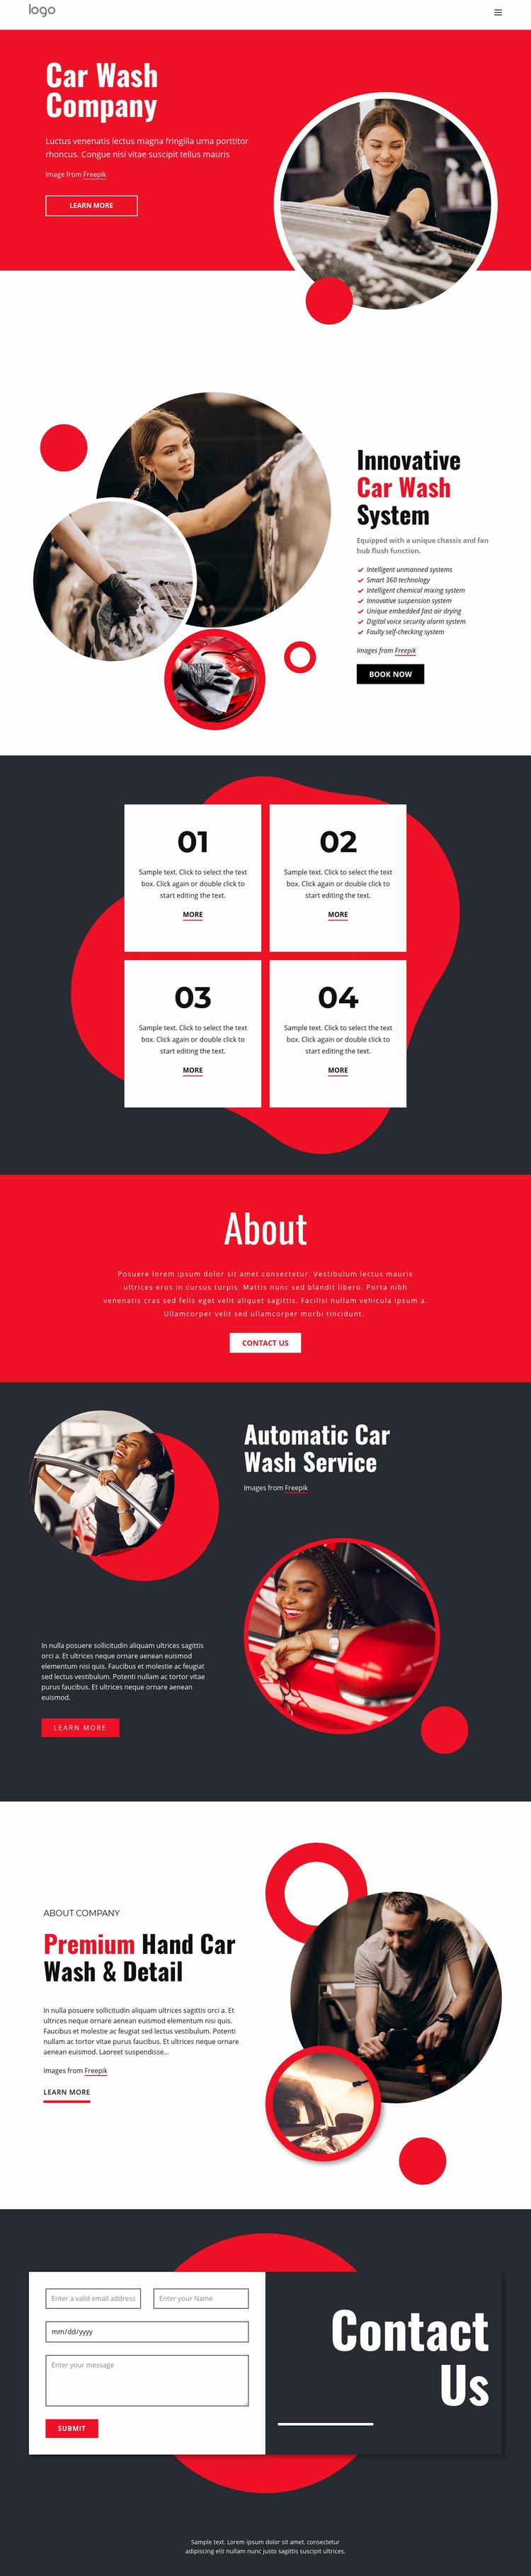 Ecologically friendly car washing Web Page Designer